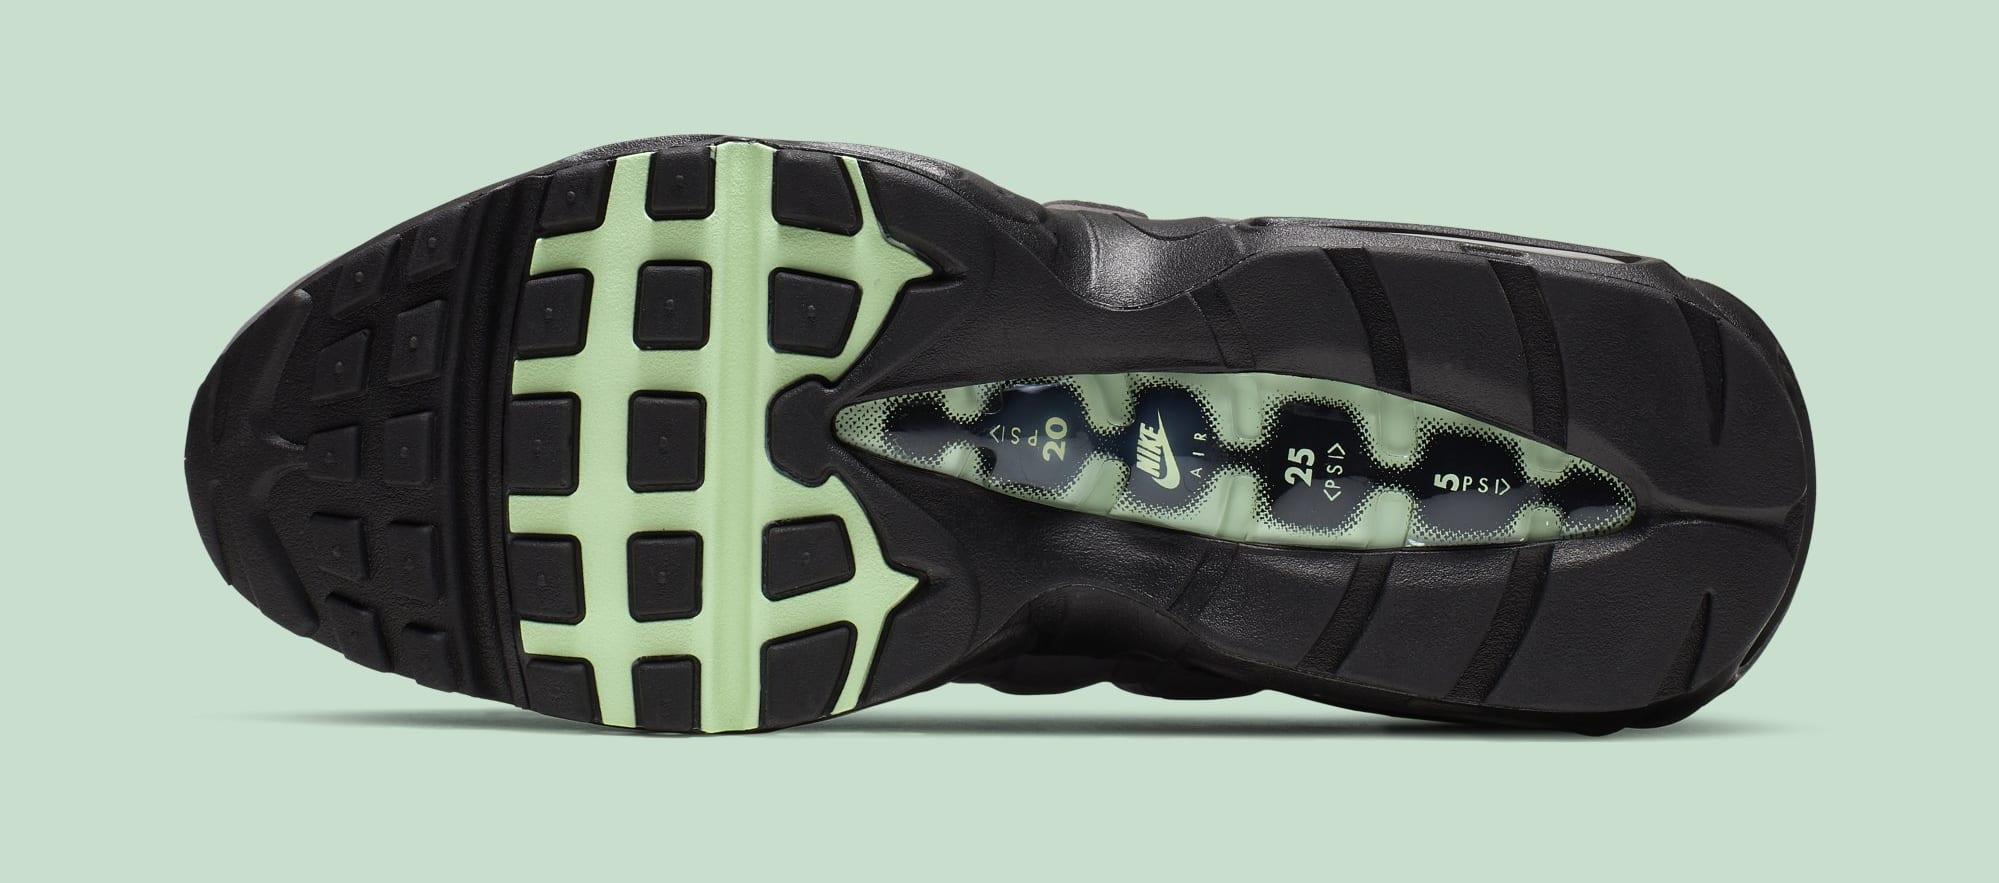 Nike Air Max 95 'Fresh Mint' CD7495-101 (Bottom)